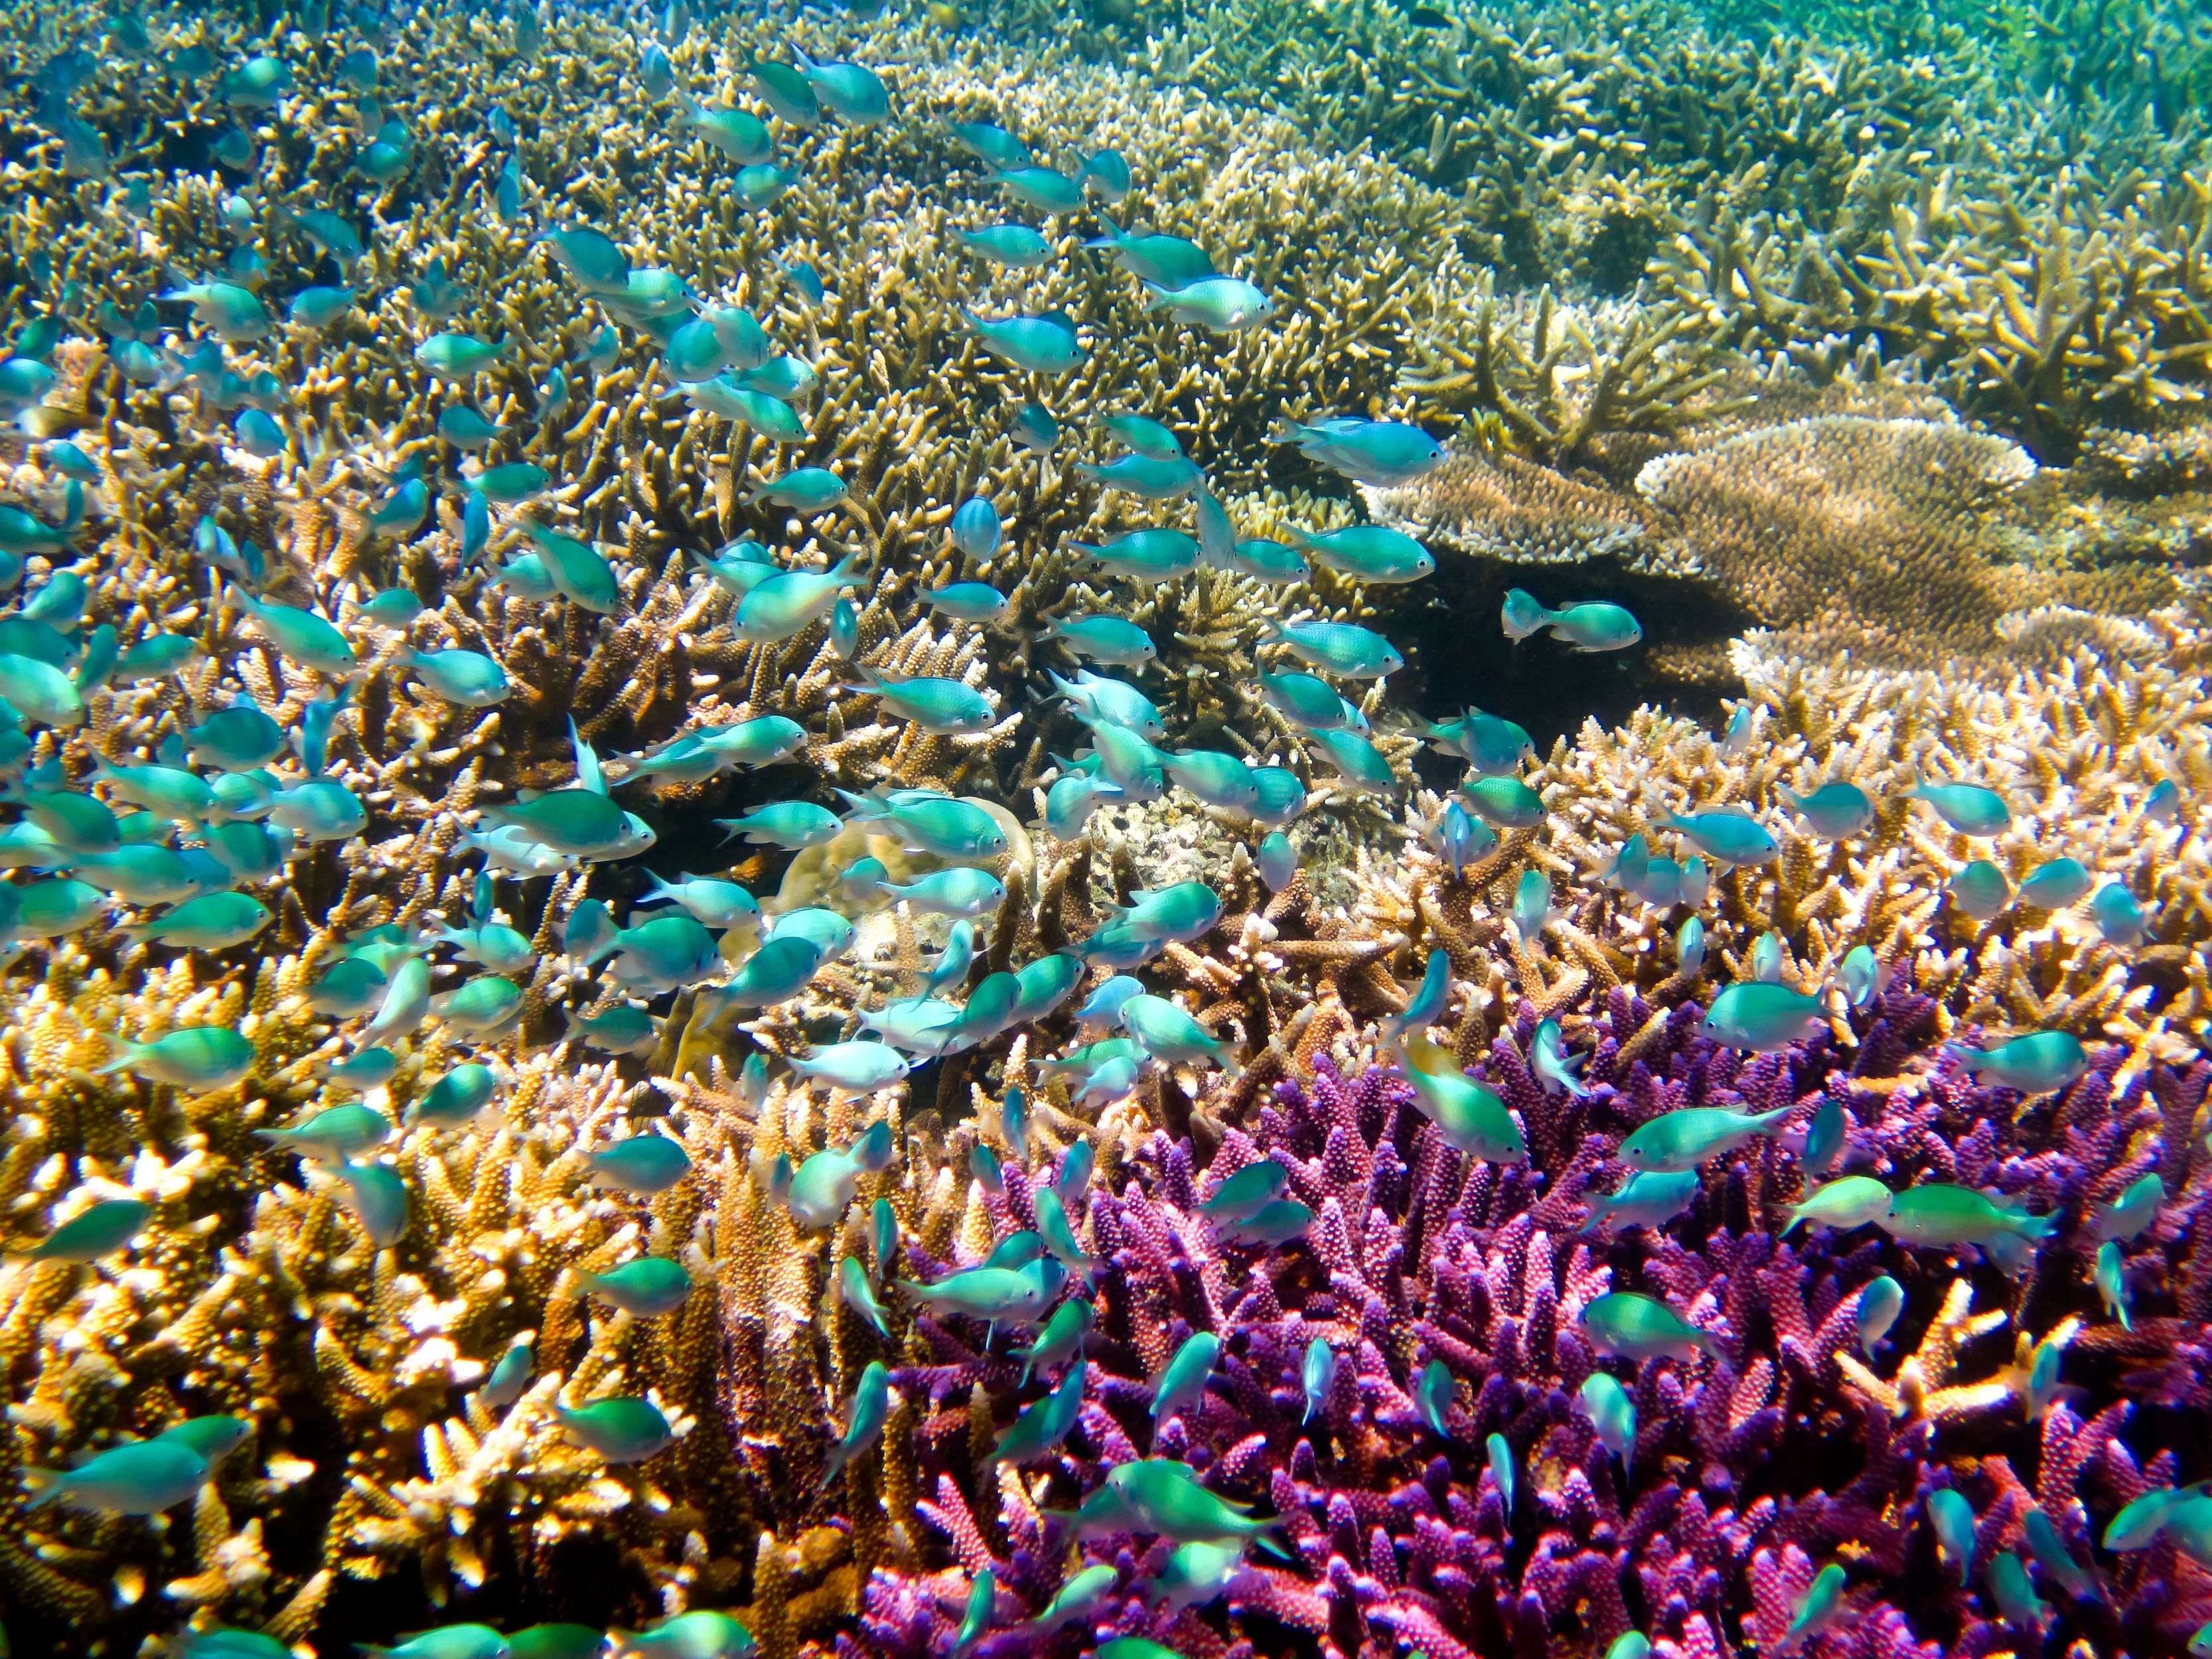 Colorido arrecife de coral con un banco de peces azules